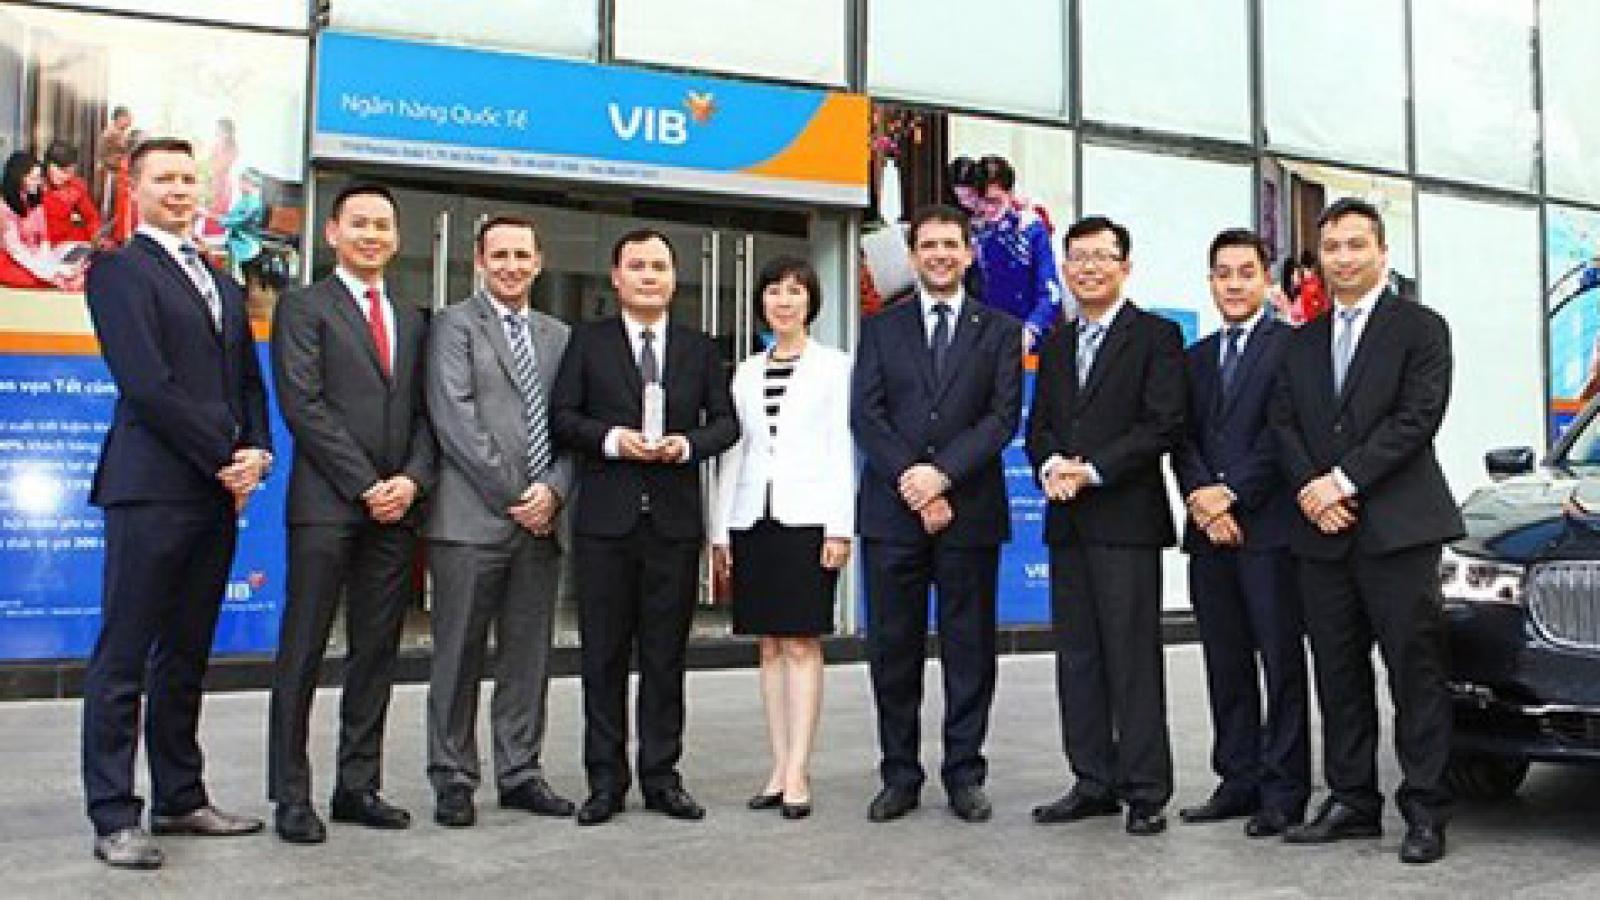 BMW, VIB sign strategic agreement